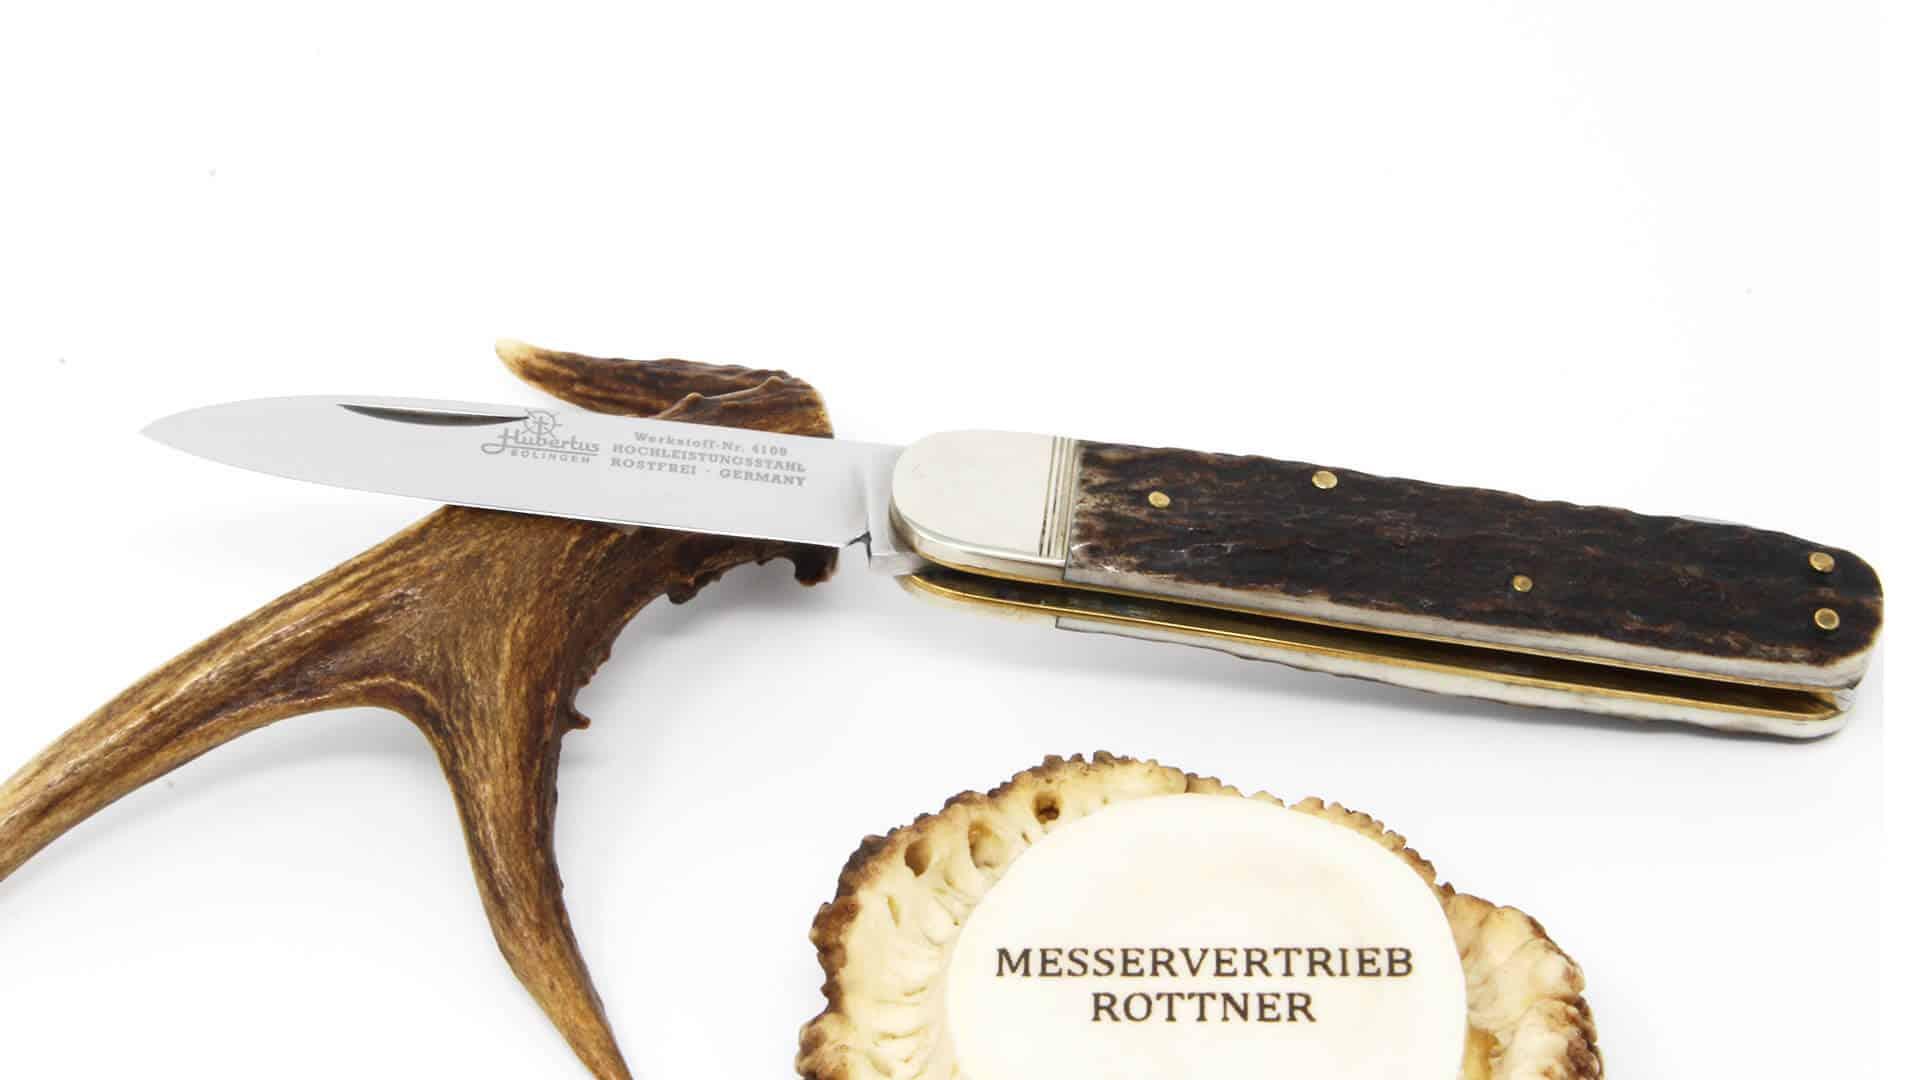 Hubertus Serie 12 Jagdtaschenmesser Messervertrieb Rottner